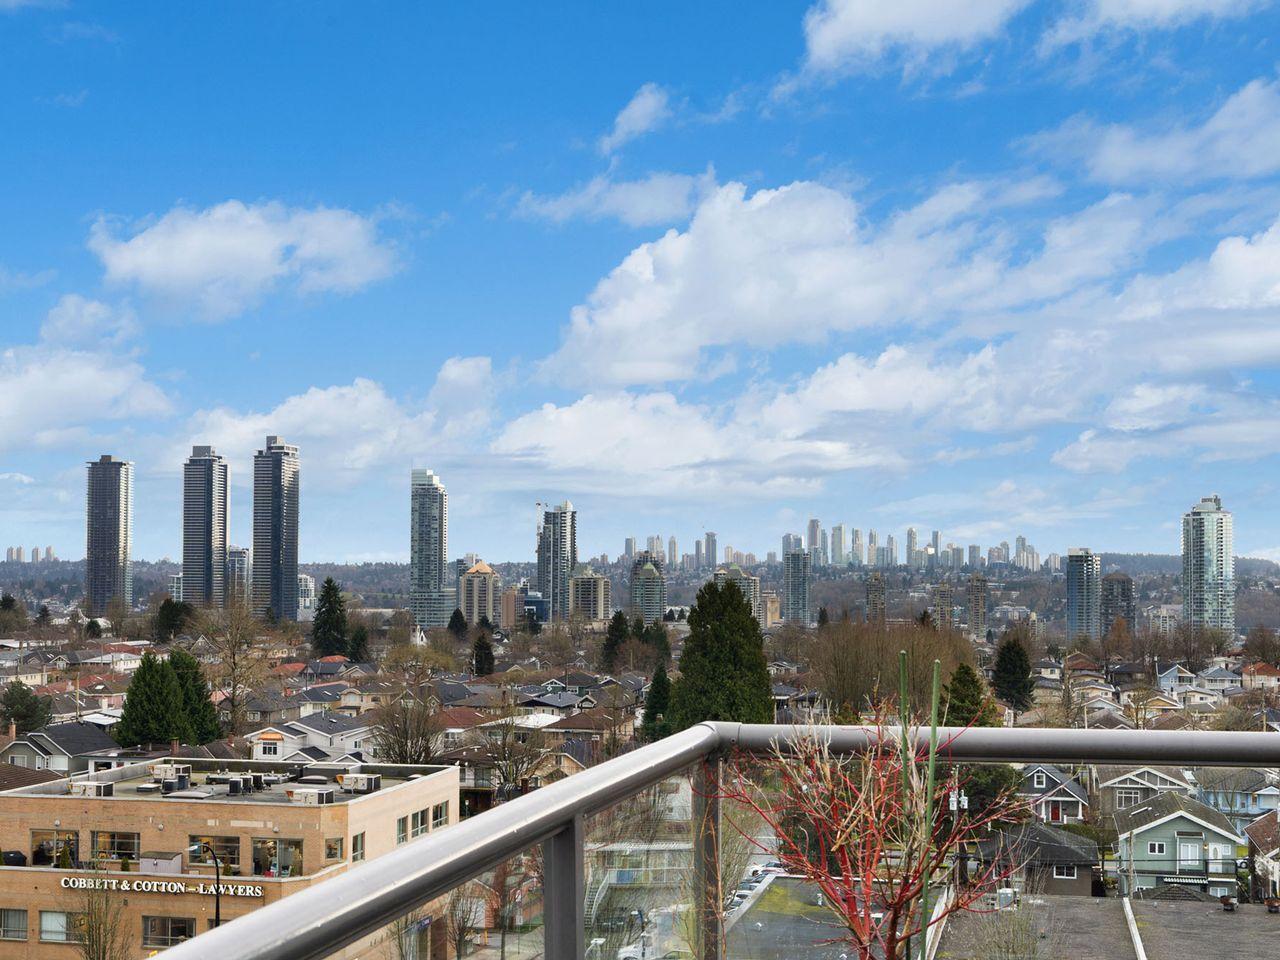 807-4160-albert-st_gavin-4660 at 807 - 4160 Albert Street, Vancouver Heights, Burnaby North